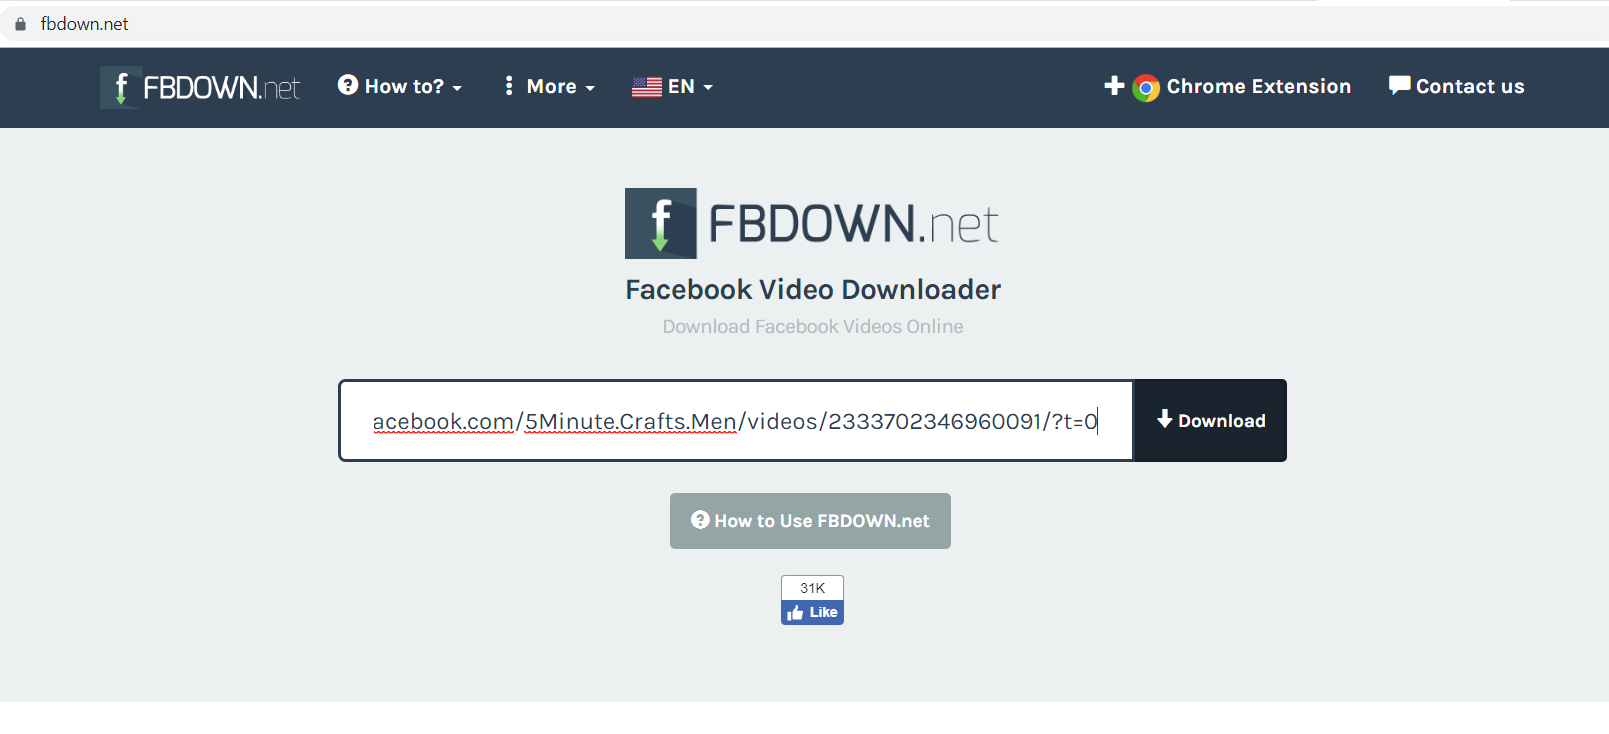 fbdown